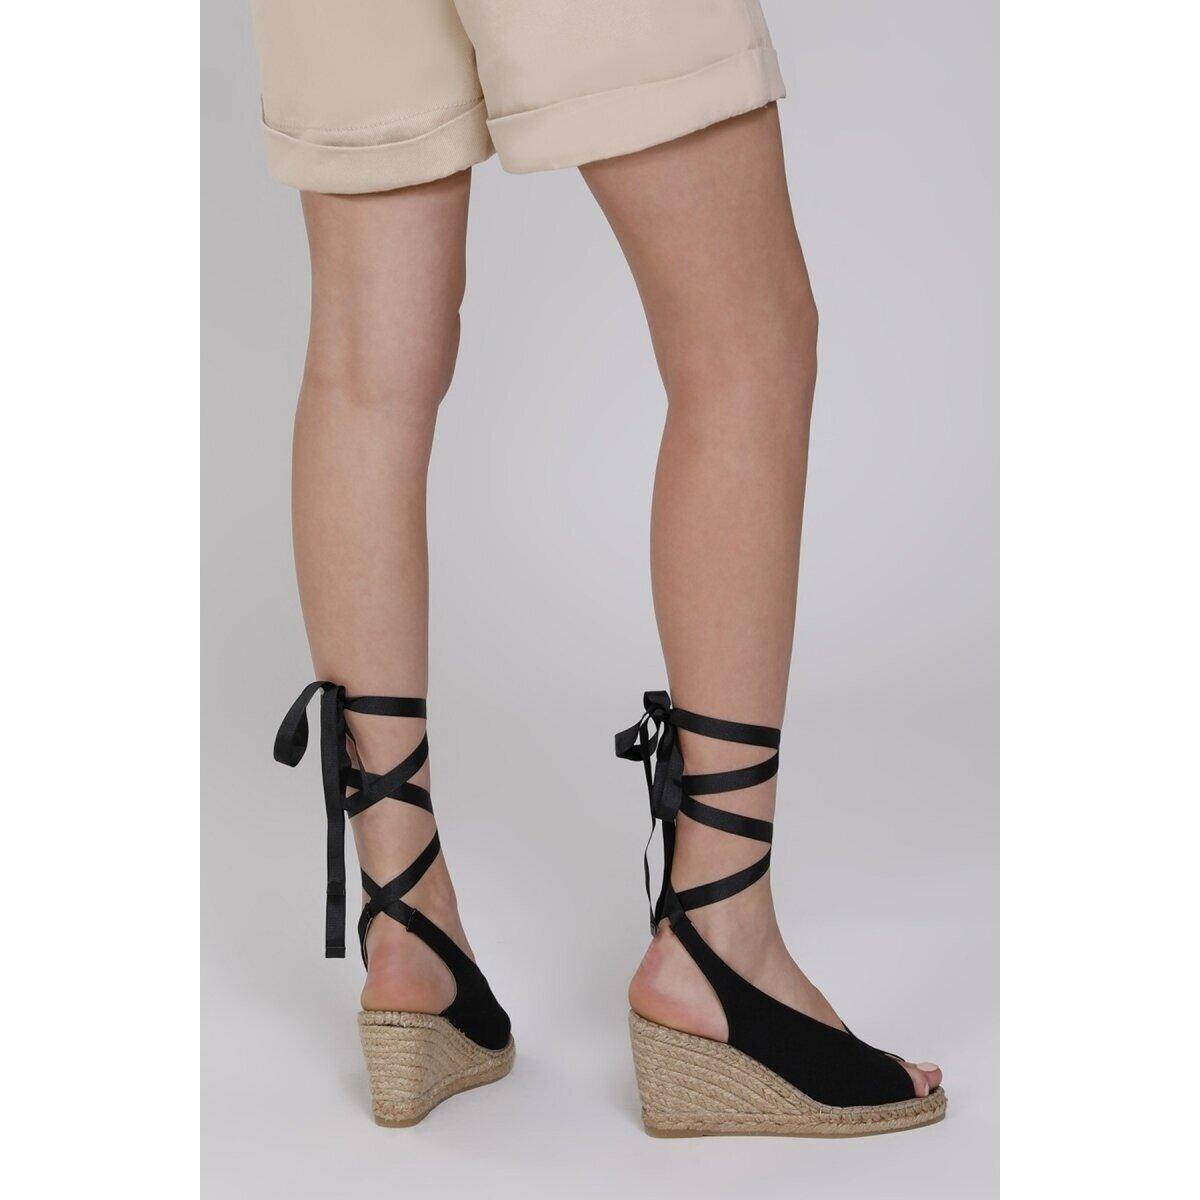 PAOLA 1FX Siyah Kadın Dolgu Topuk Sandalet